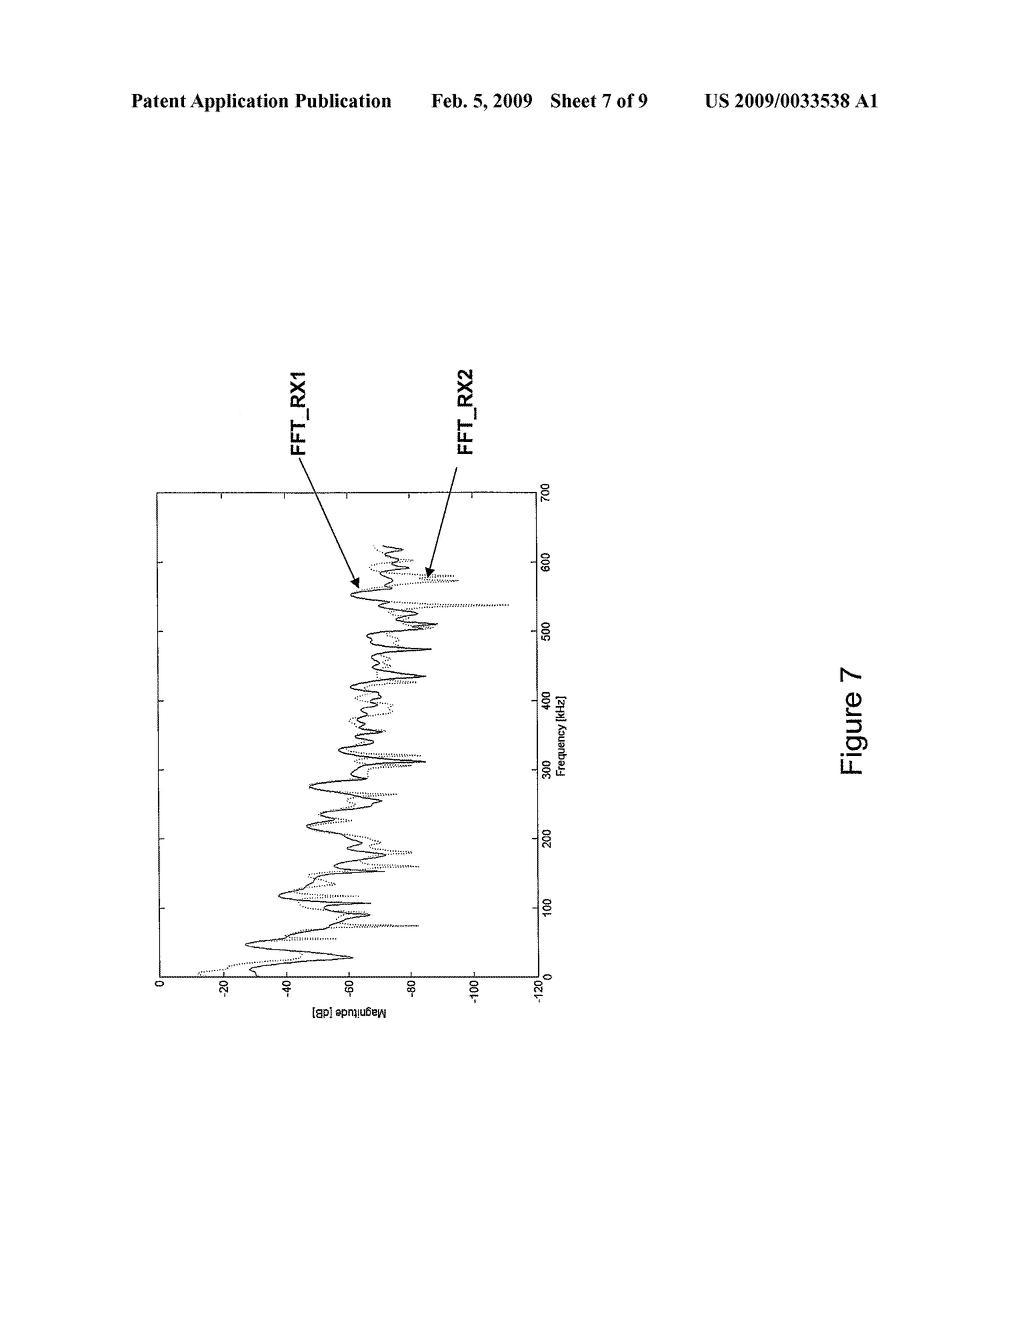 Ramp Linearization for FMCW Radar Using Digital Down